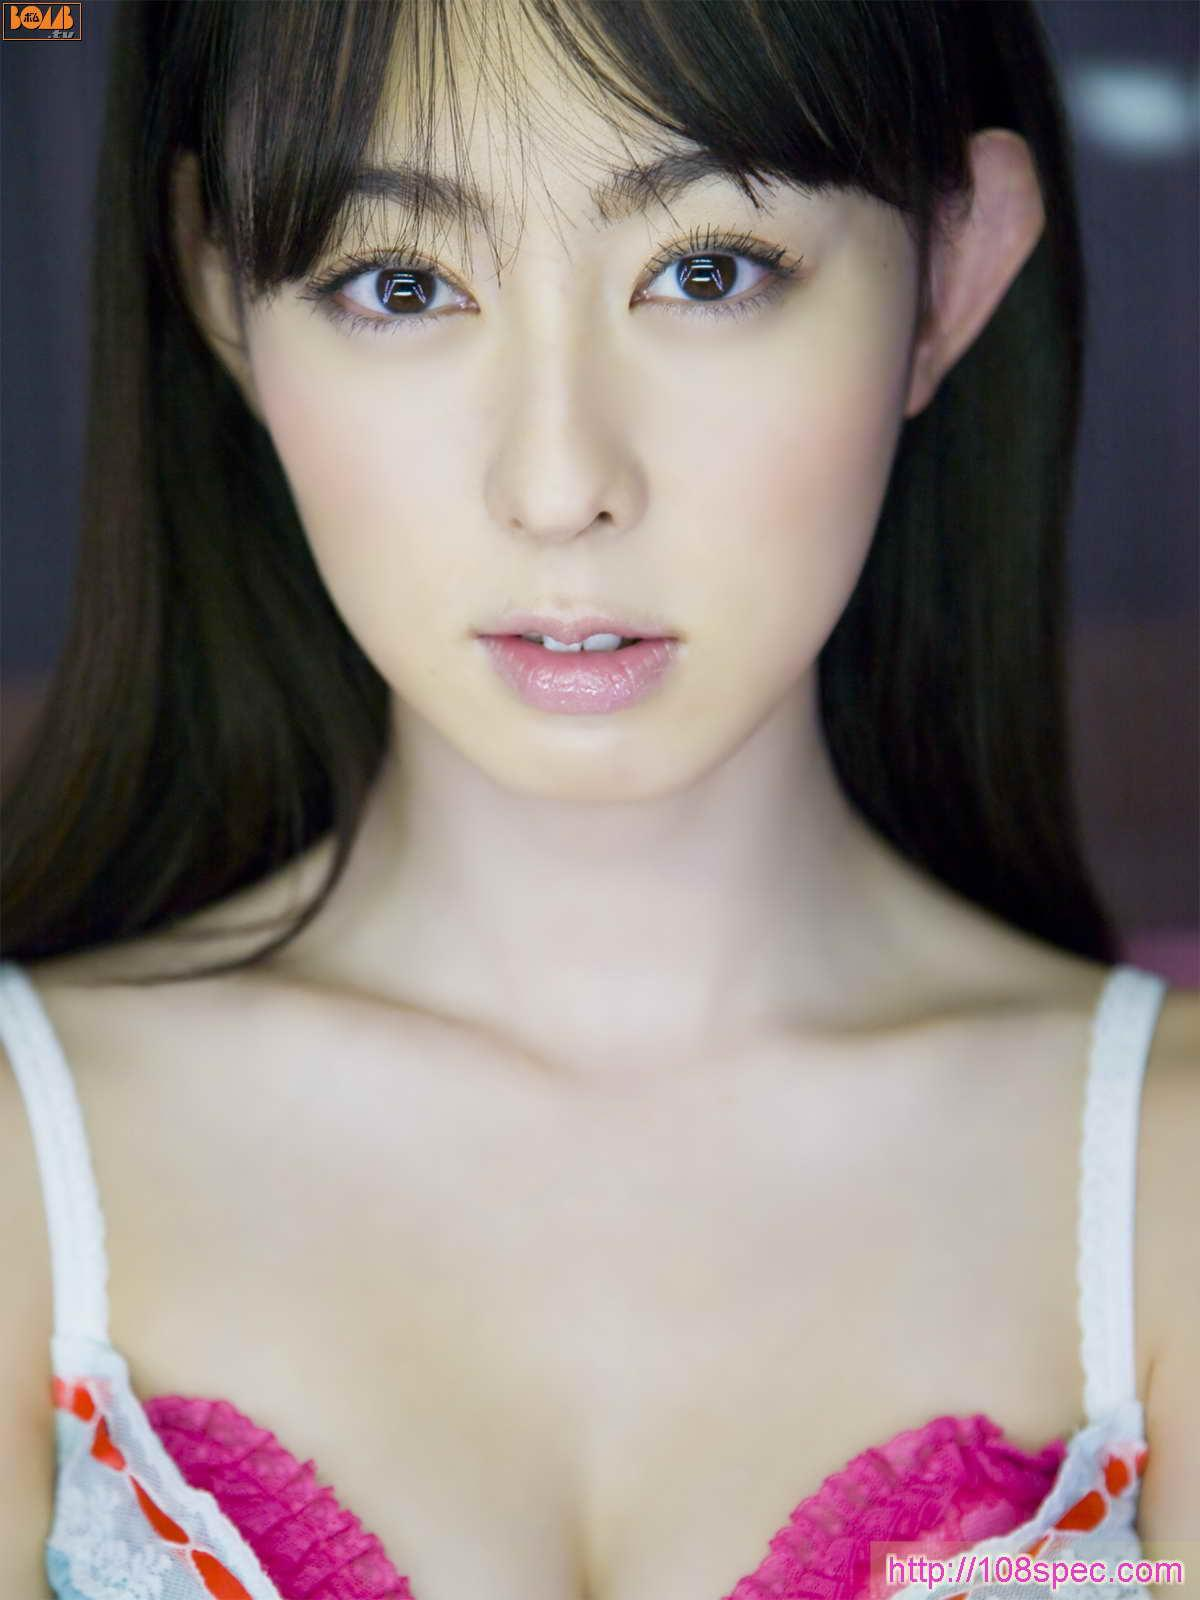 Japan Model Gallery: Japanese Model beauty face 3